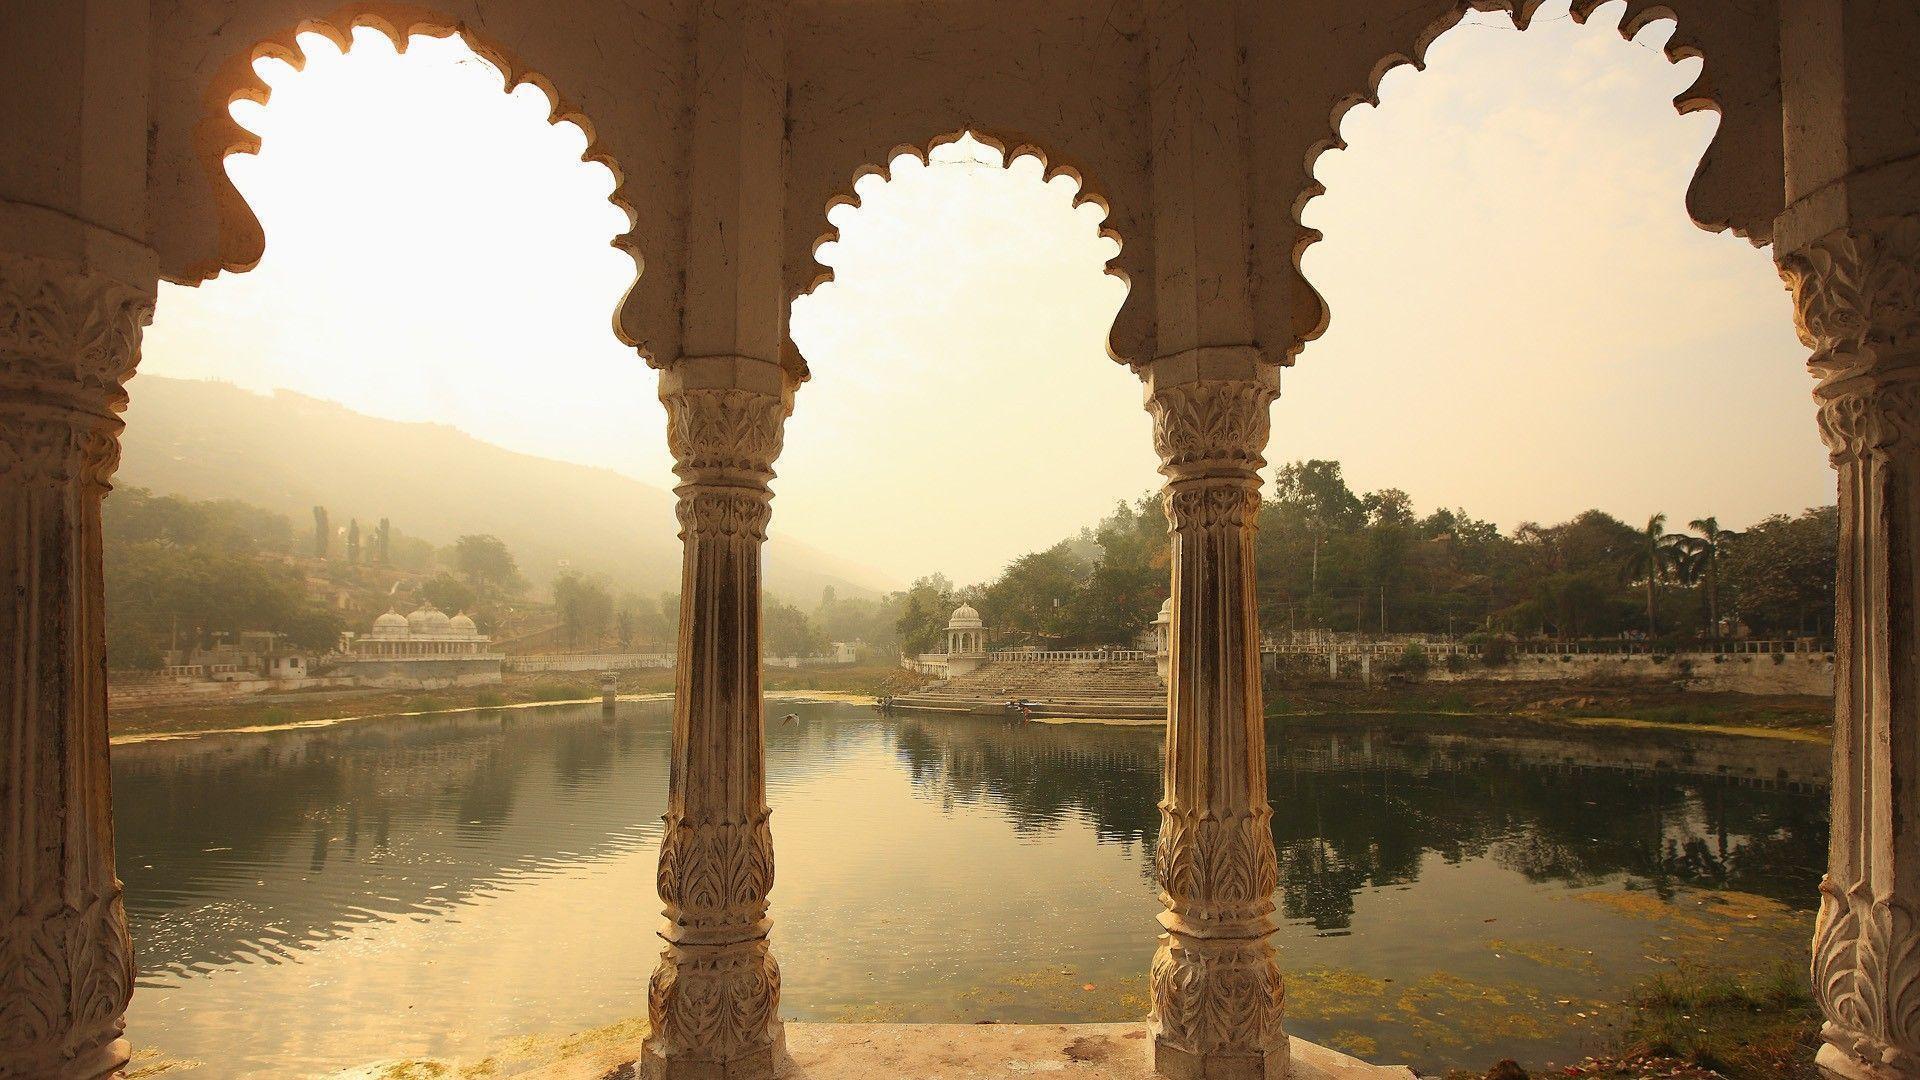 Wallpapers Hd India Wallpaper Cave